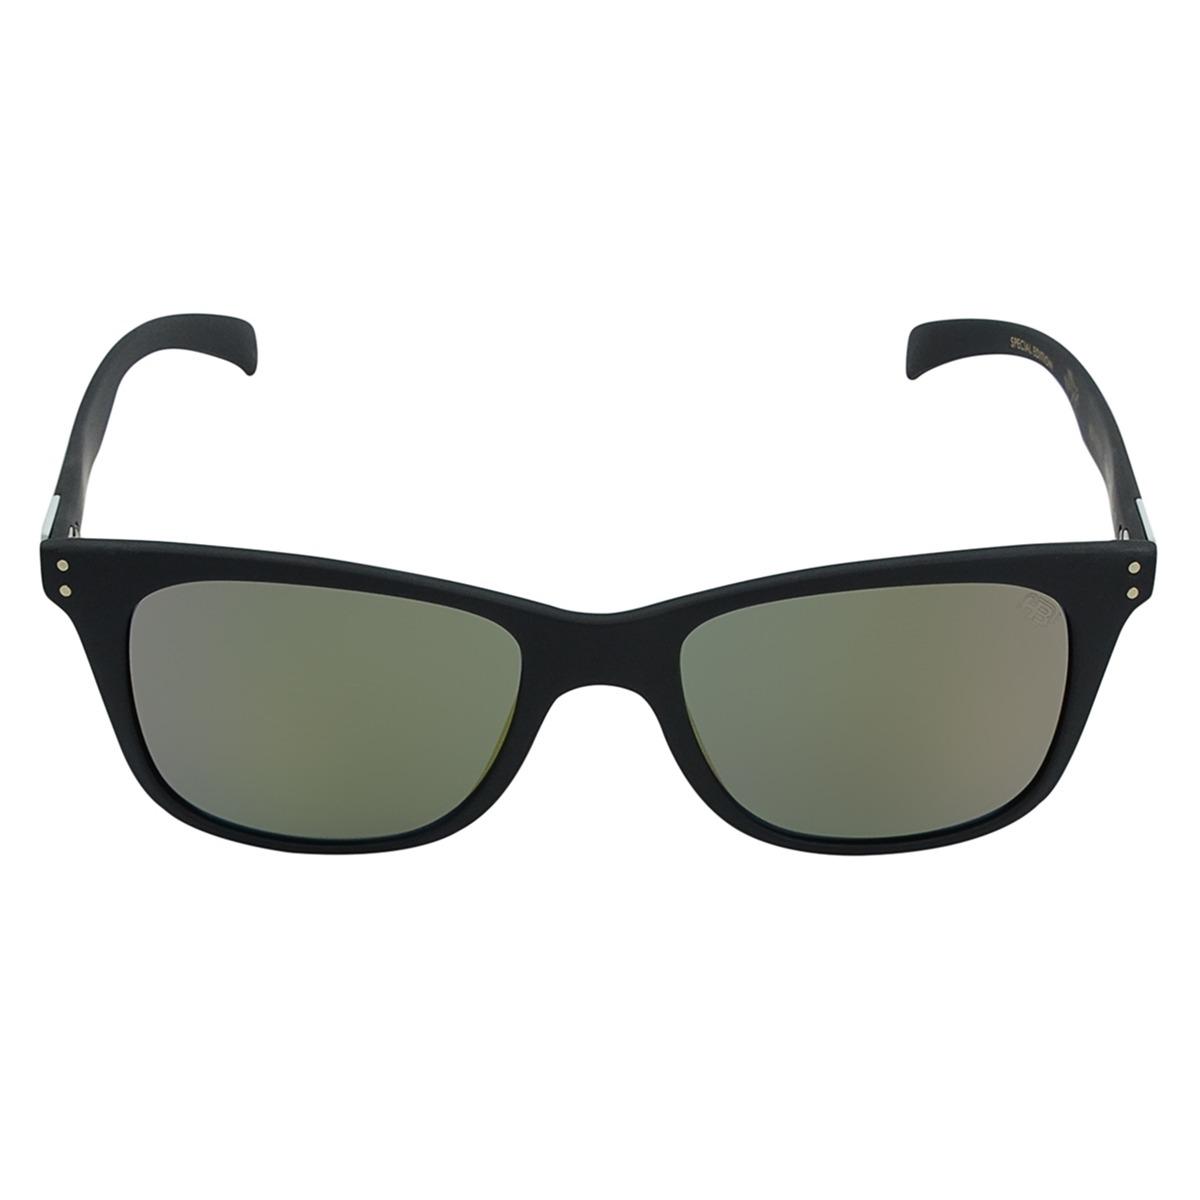 da07197fbe3a4 Óculos Masculino Hb Landshark Ii Preto Fosco - R  399